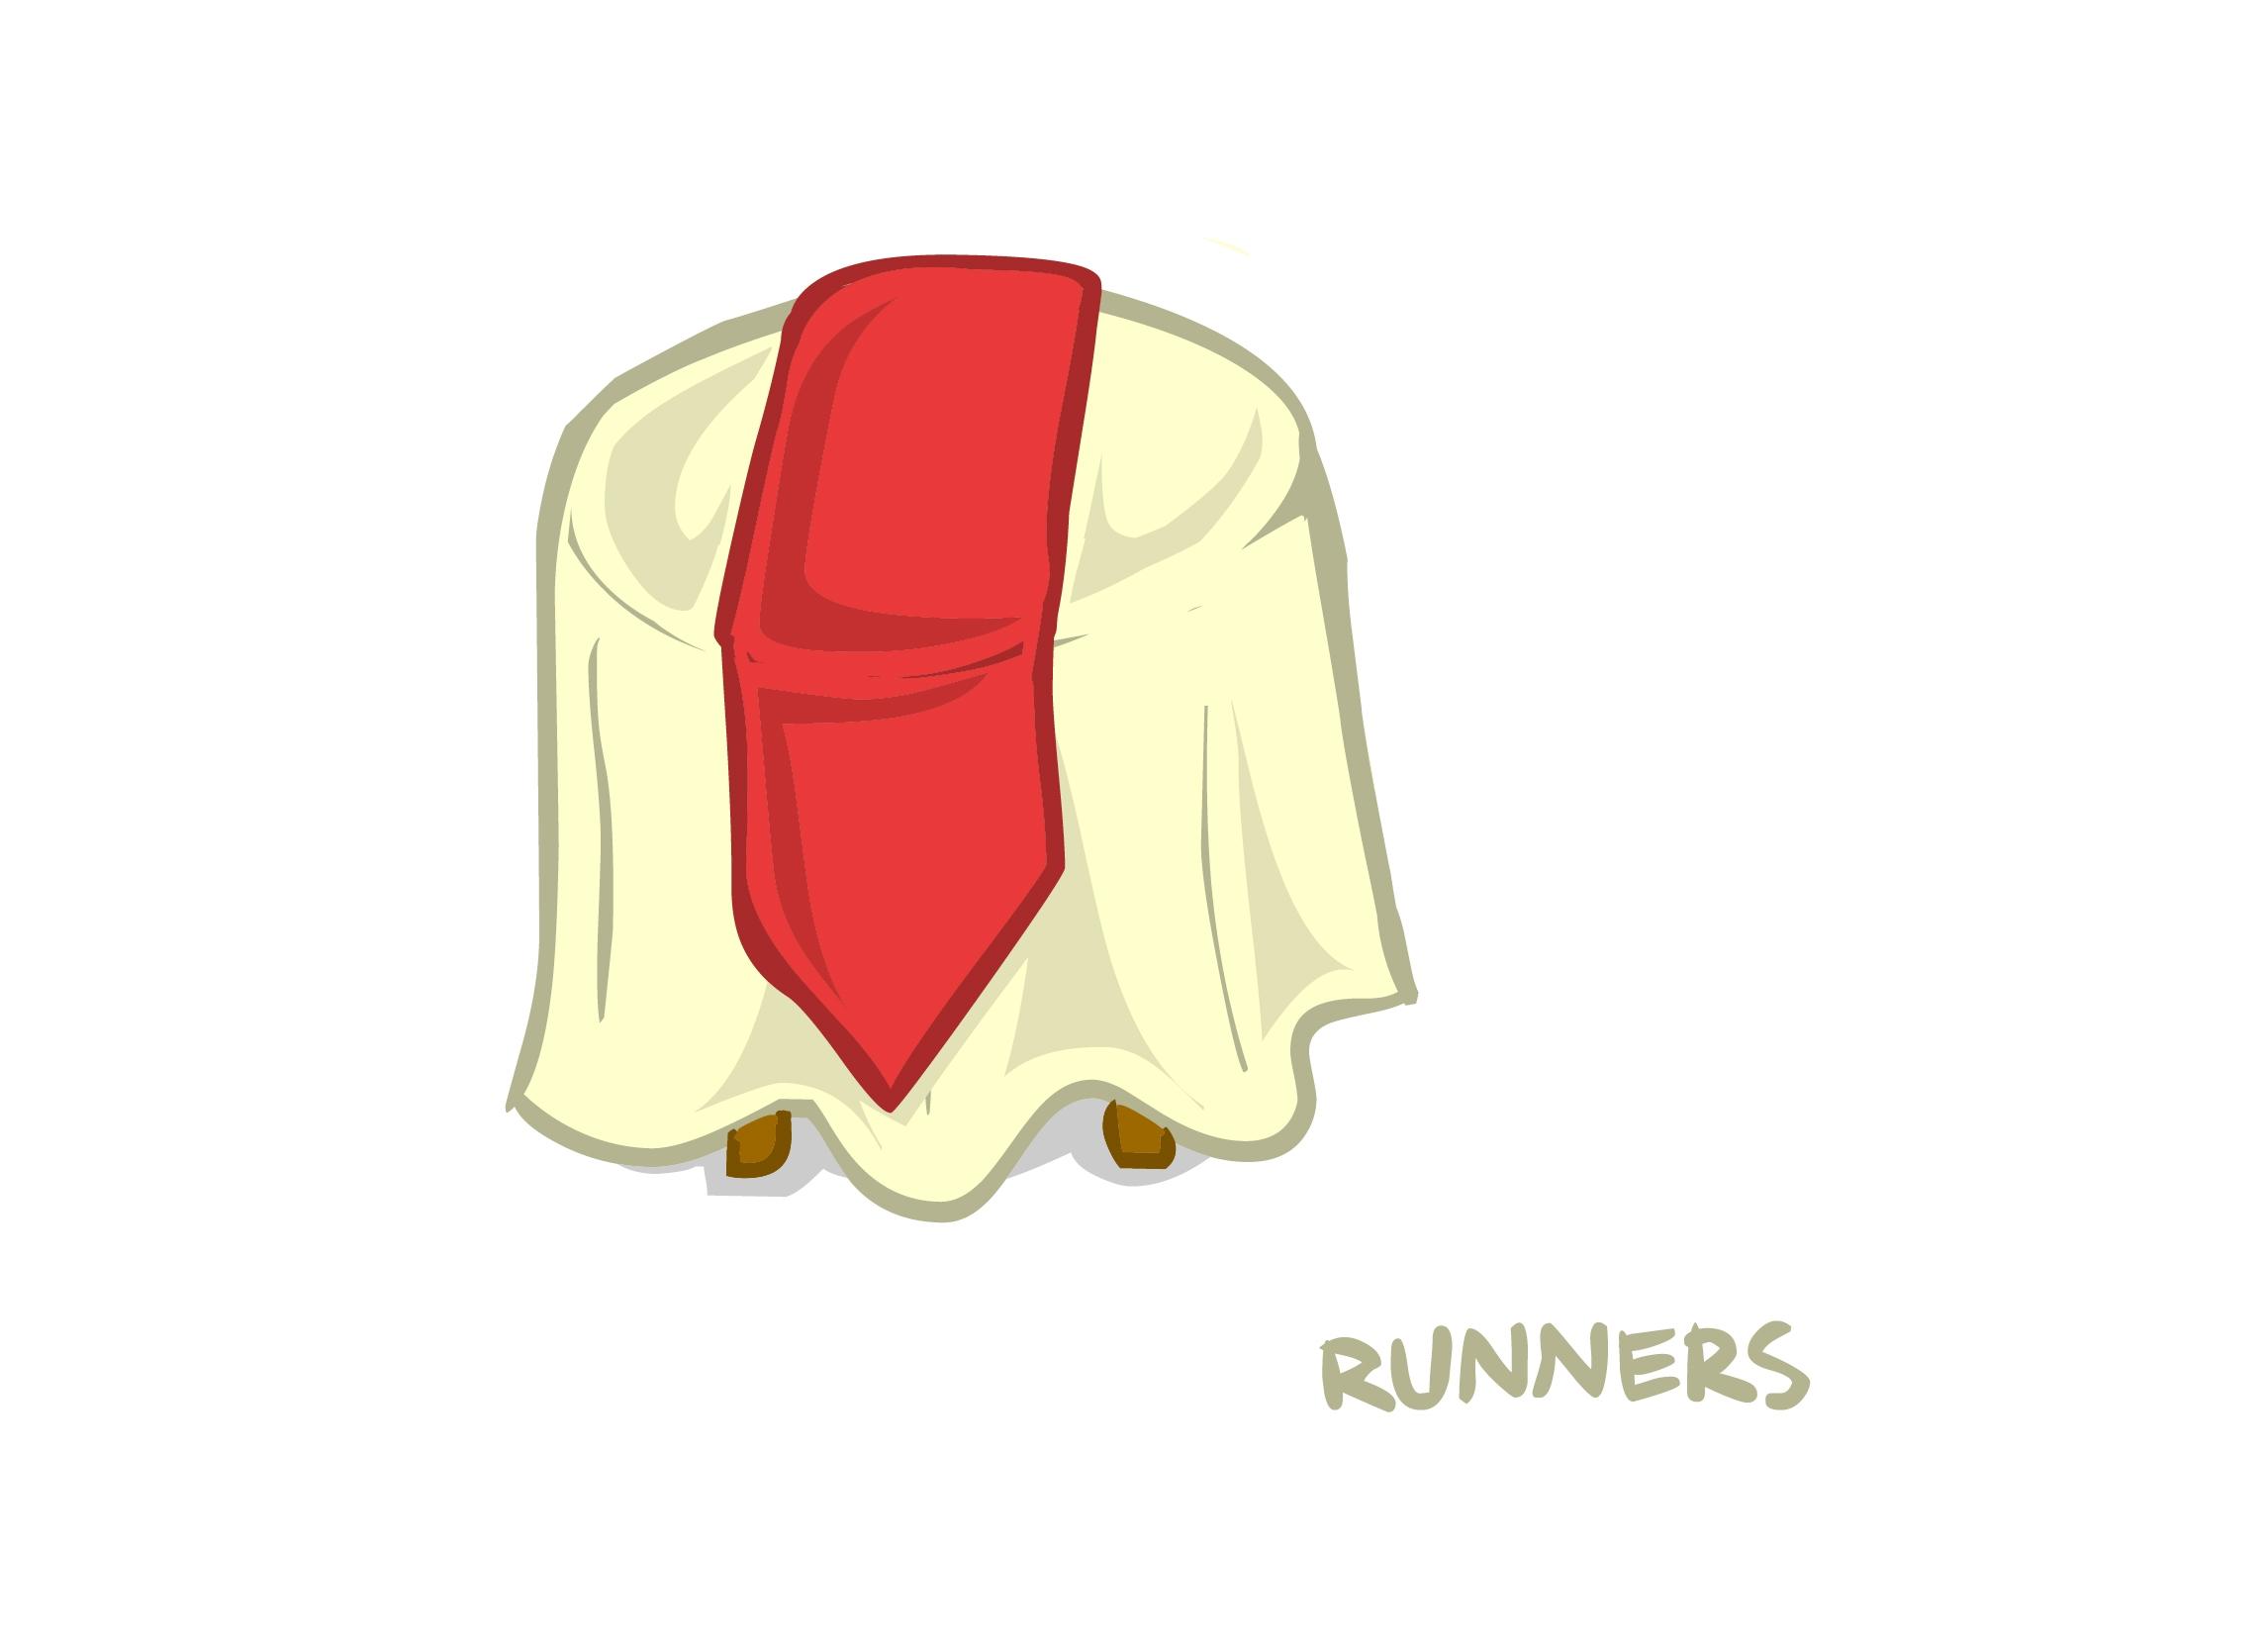 Tissue Lamé Runners 01348